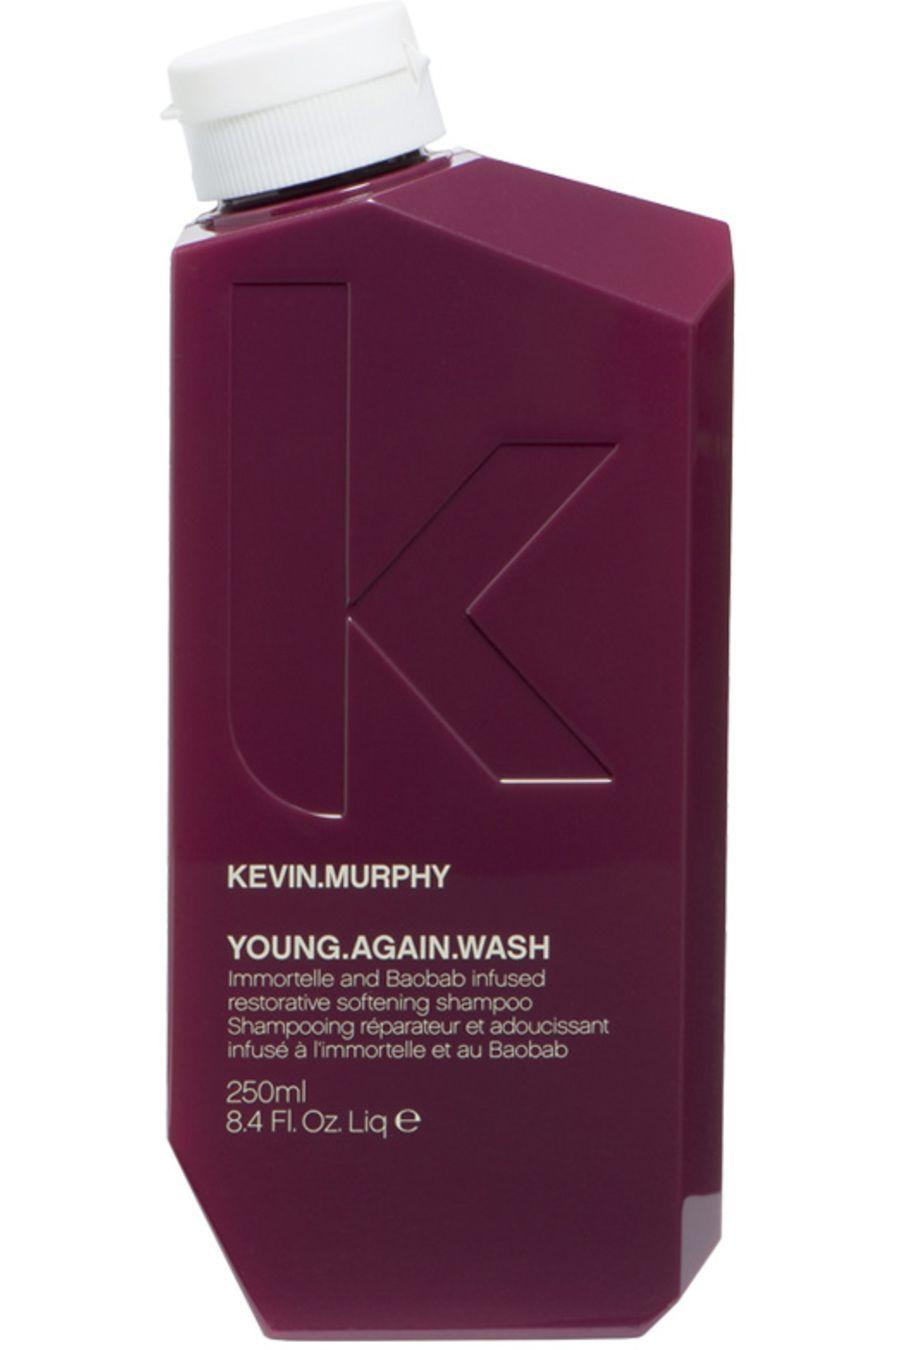 Blissim : KEVIN.MURPHY - Shampoing réparateur et adoucissant YOUNG.AGAIN.WASH - Shampoing réparateur et adoucissant YOUNG.AGAIN.WASH